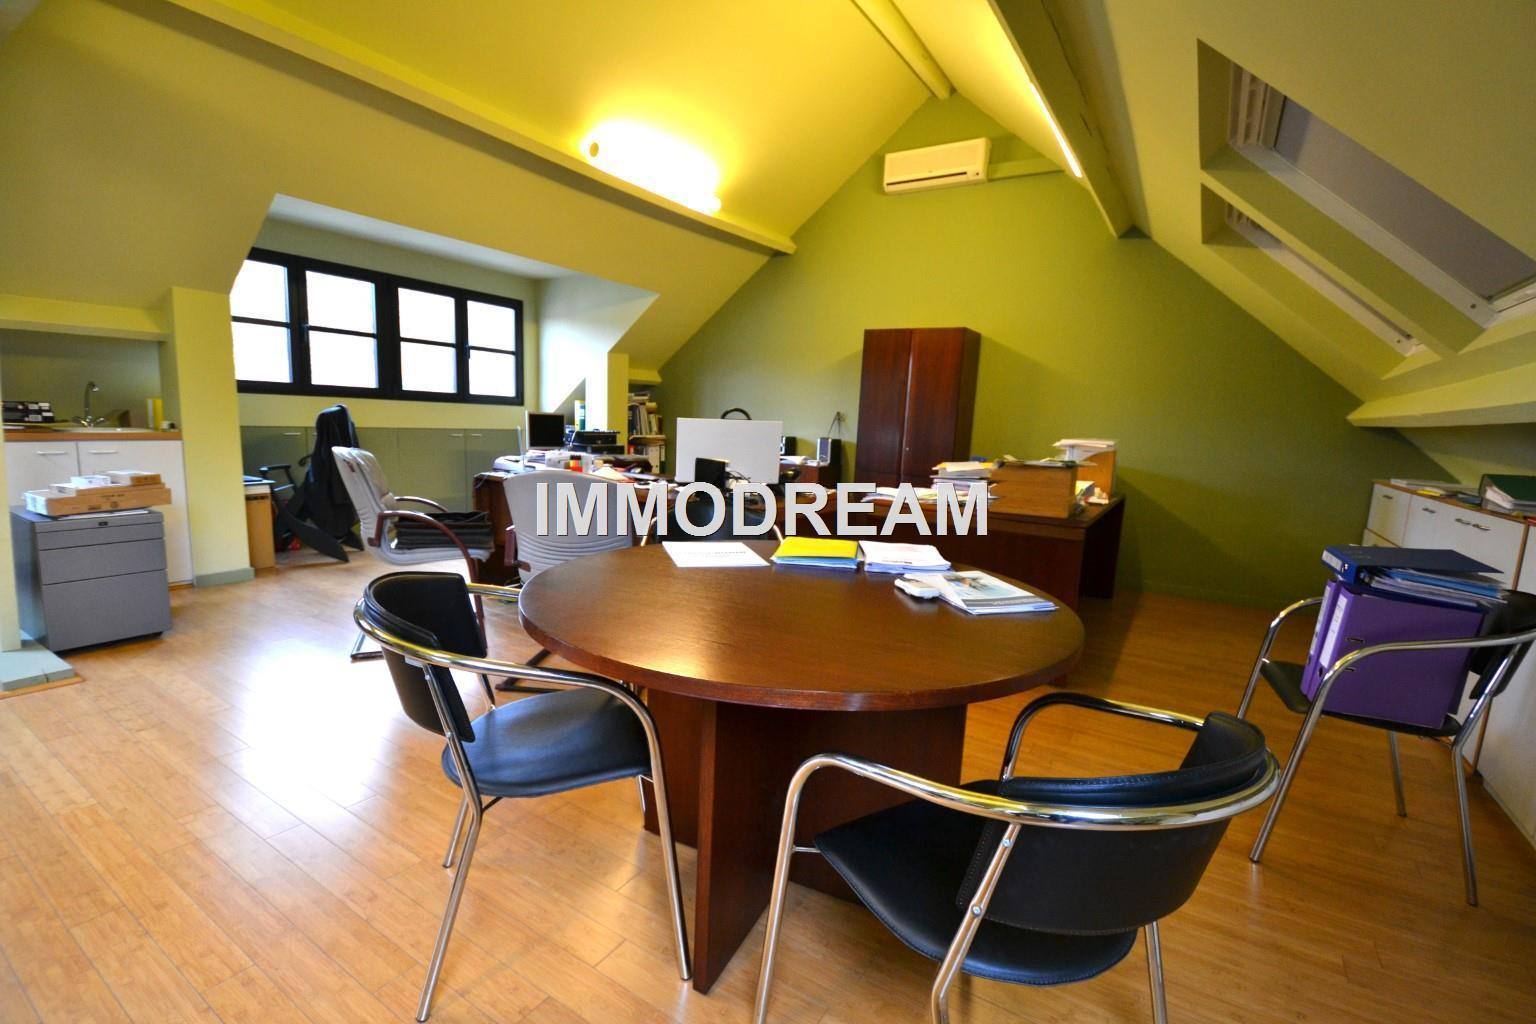 Mixt building off + res. - Woluwe-Saint-Lambert - #4025861-26